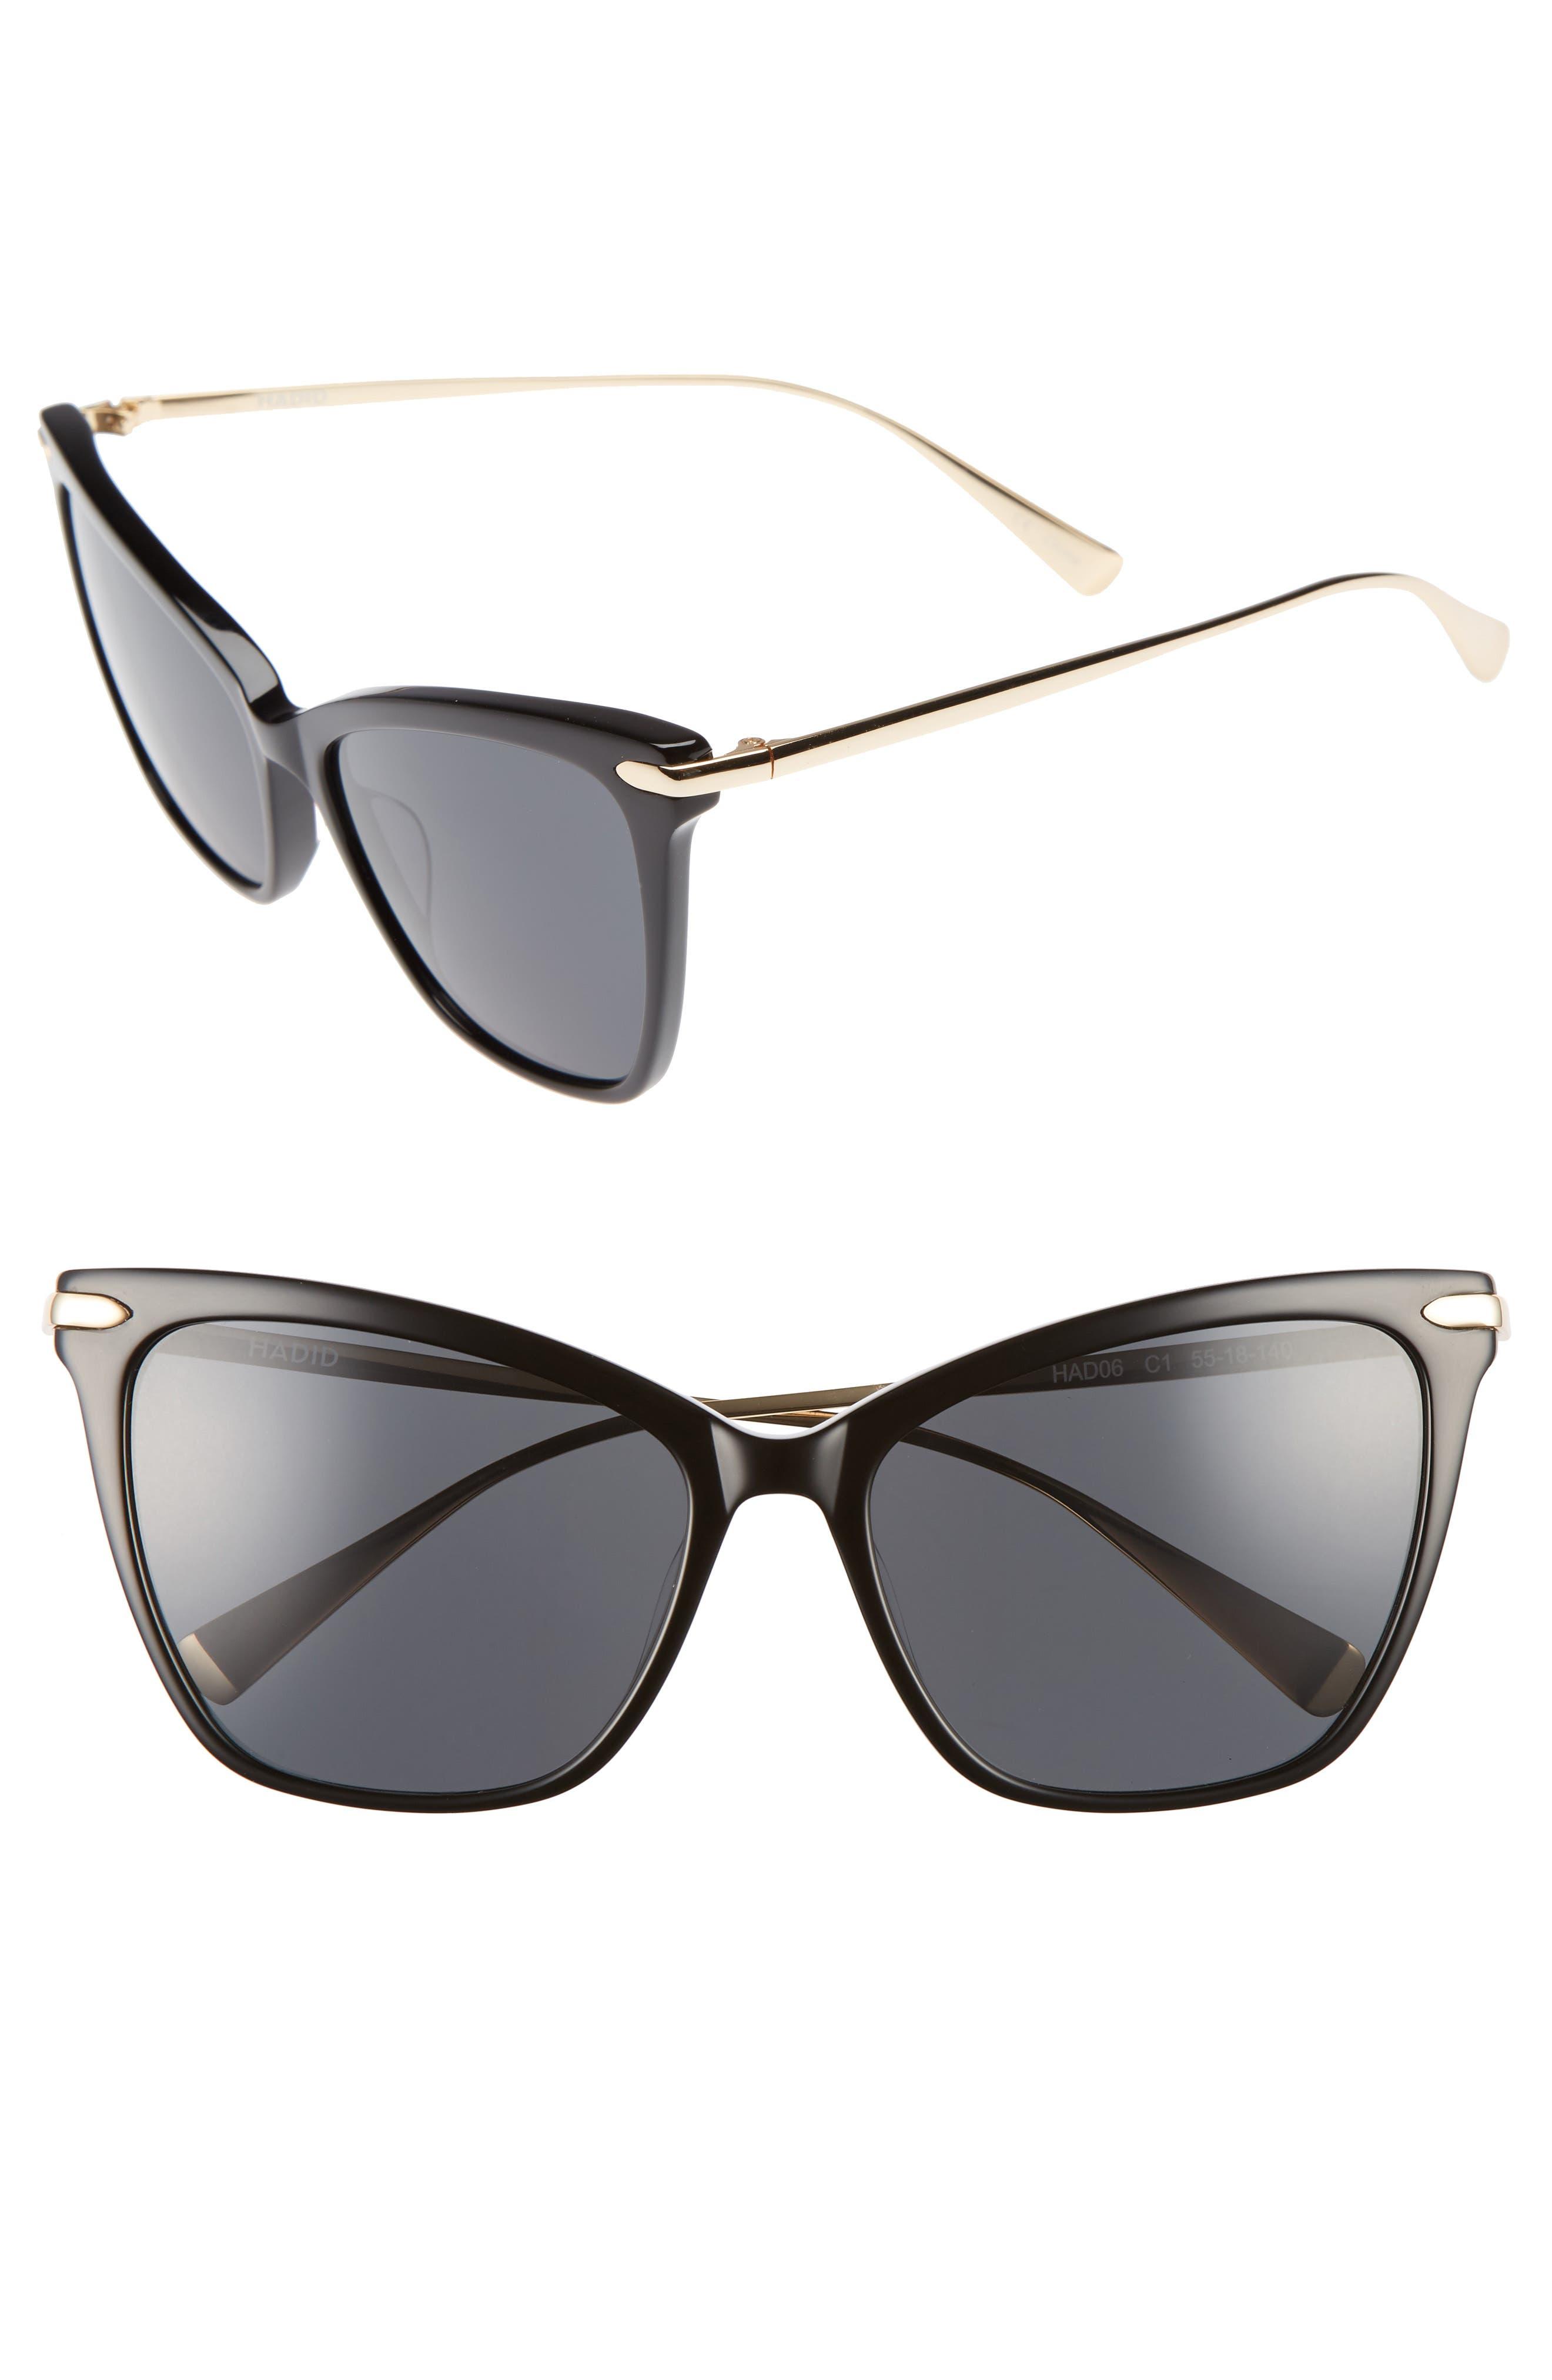 Jetsetter 55mm Cat Eye Sunglasses,                             Main thumbnail 1, color,                             001